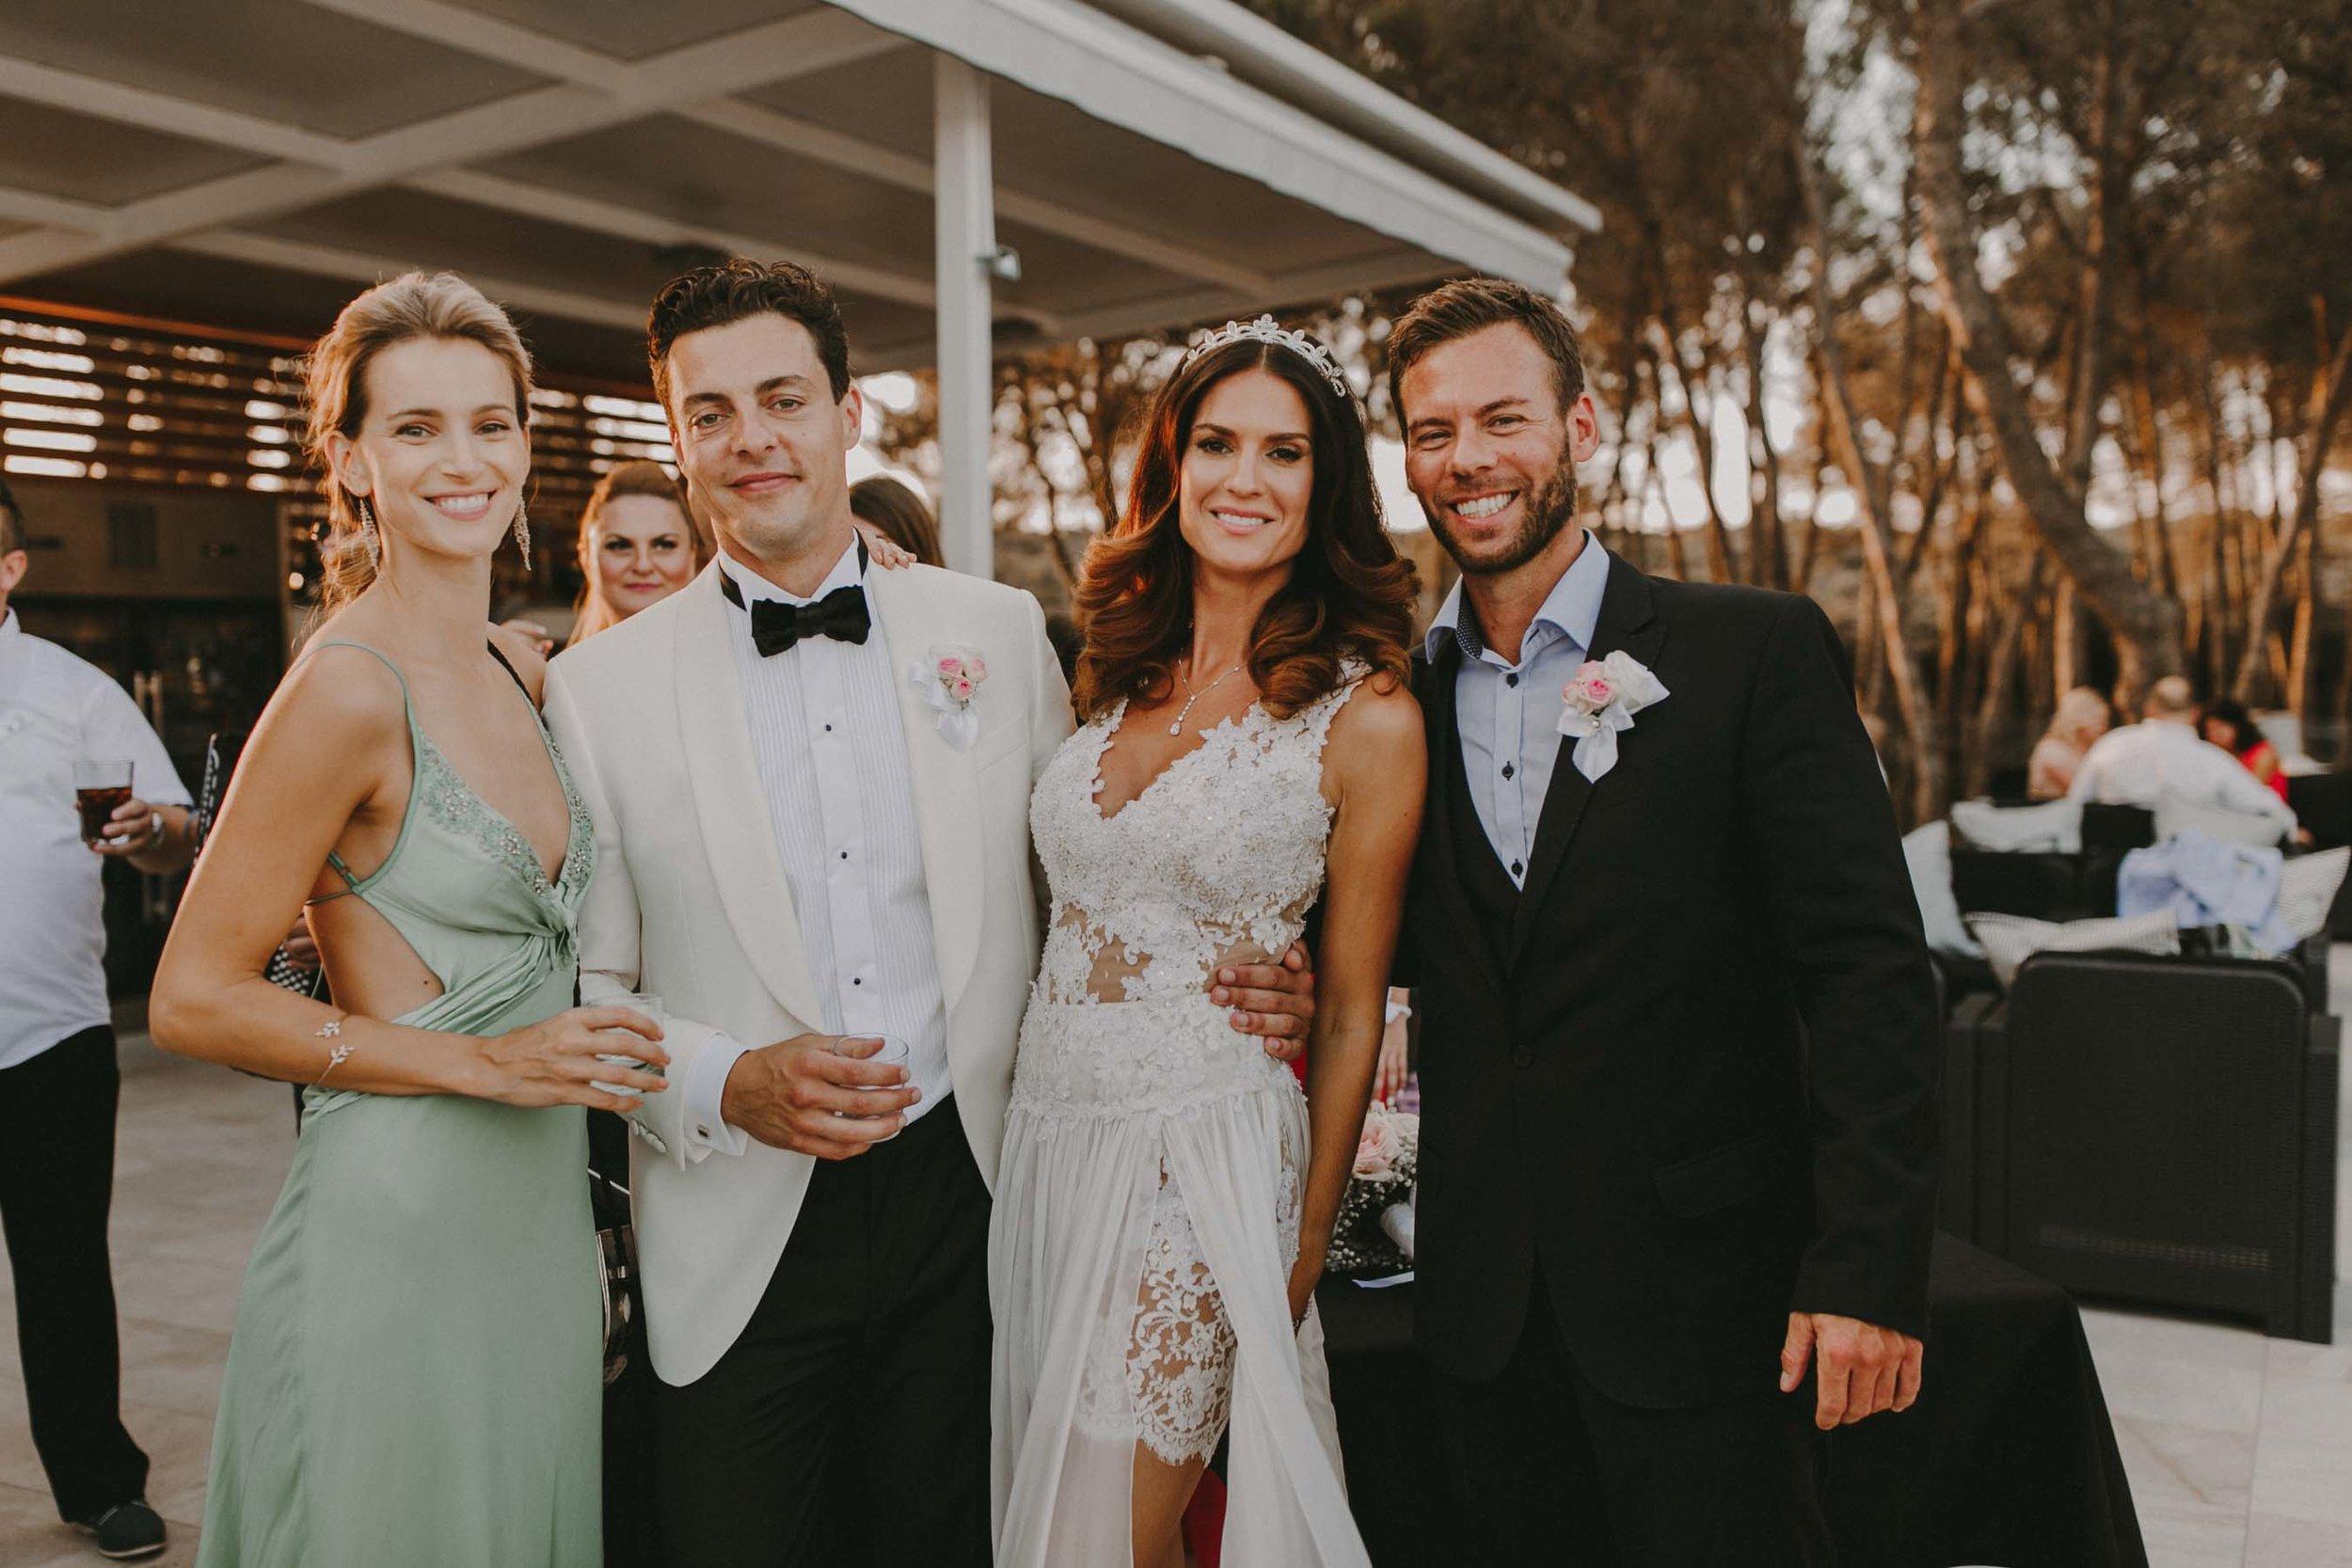 sylvia&dimitri-Wedding-Crvena_Luka-Croatia-63(8505).jpg